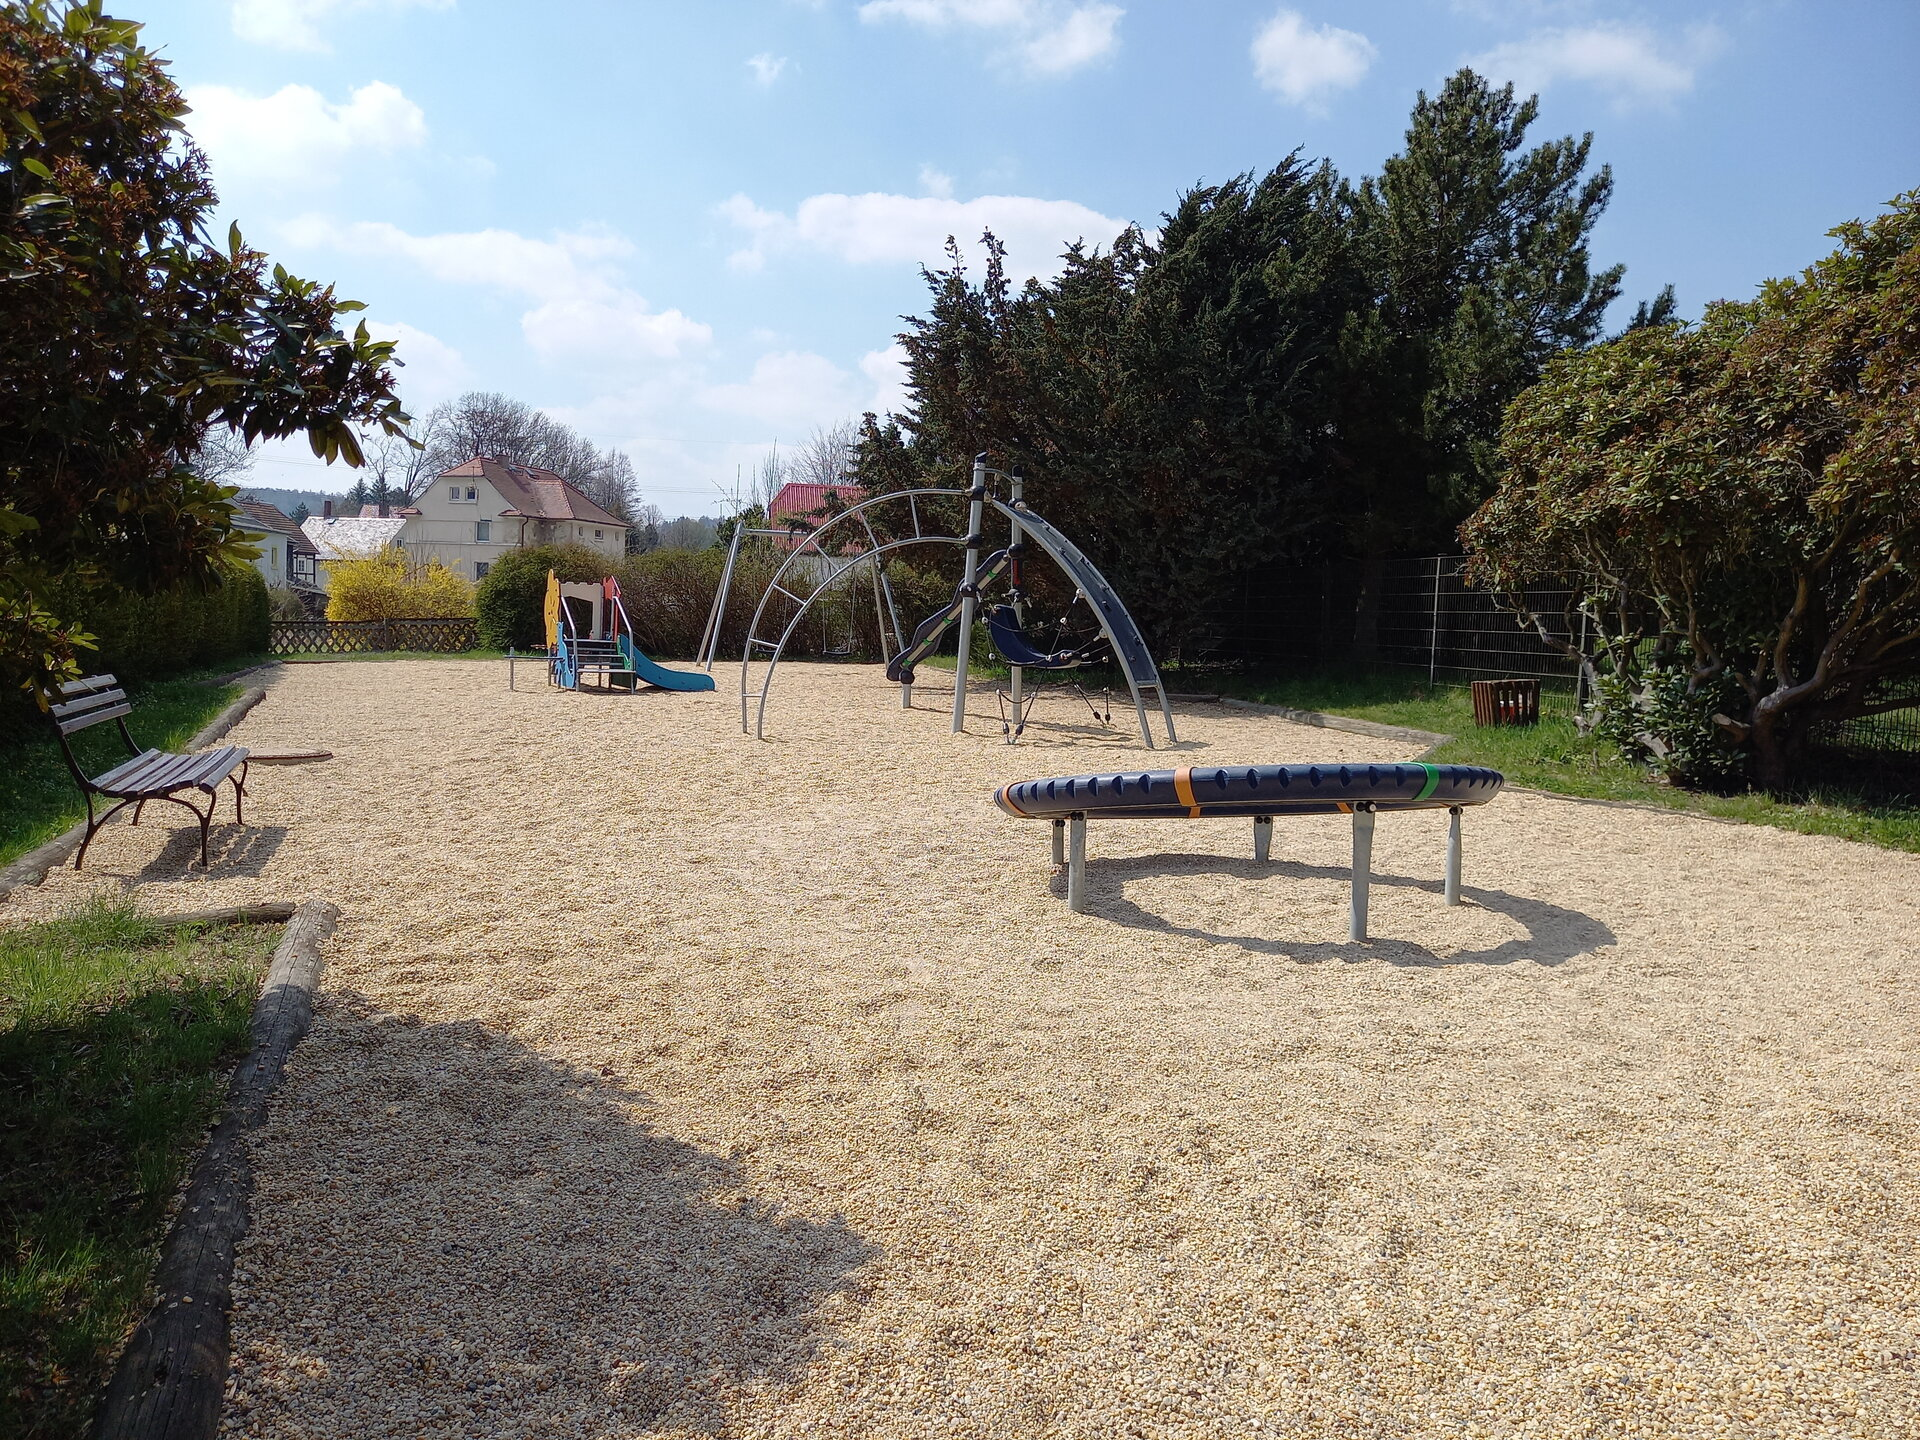 Spielplatz in Lawalde am Kretscham